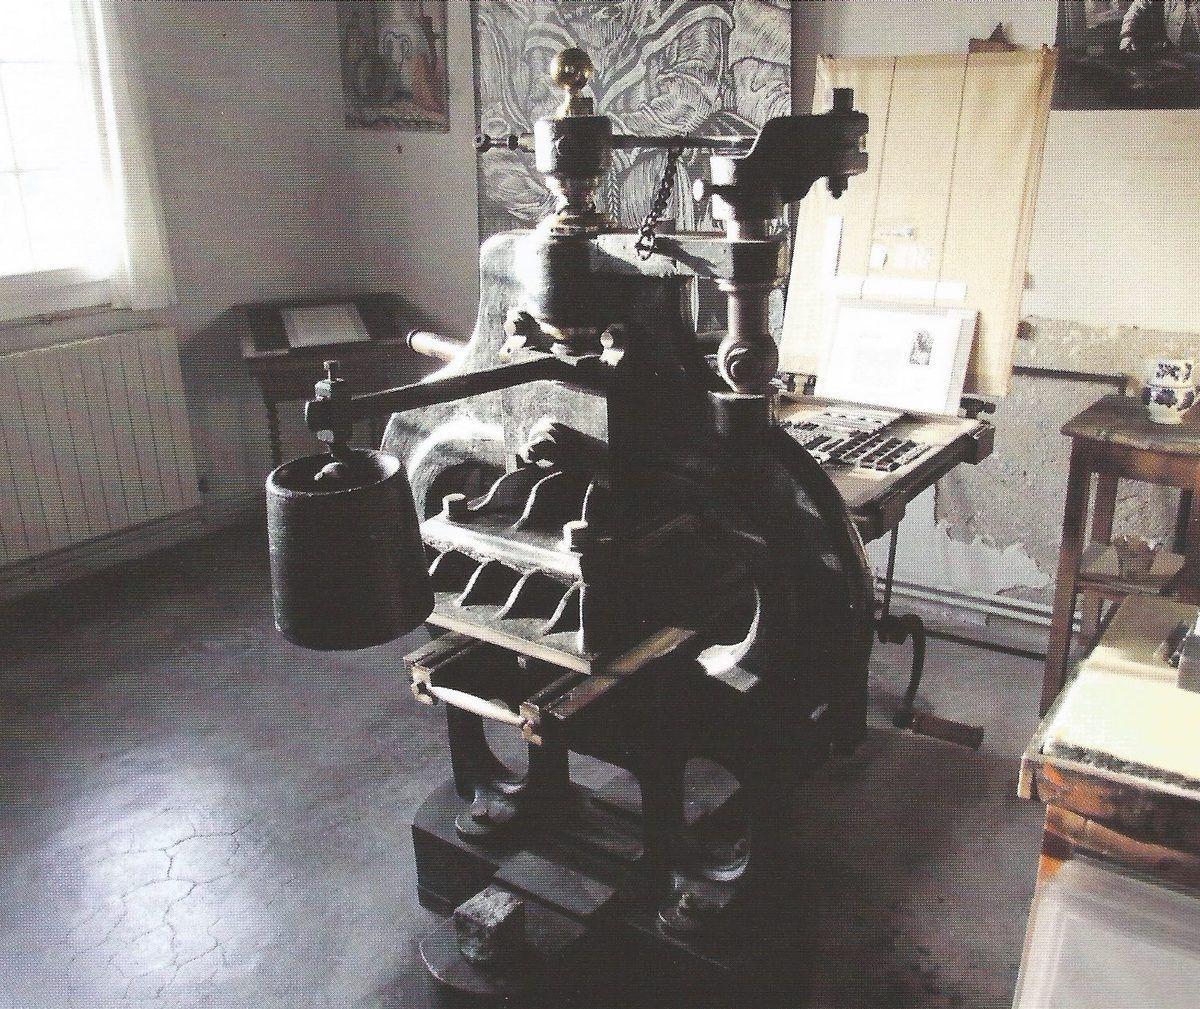 Photo © PLUME – N° 58 – 2011 – Presse Stanhope de Louis Jou dans son atelier.